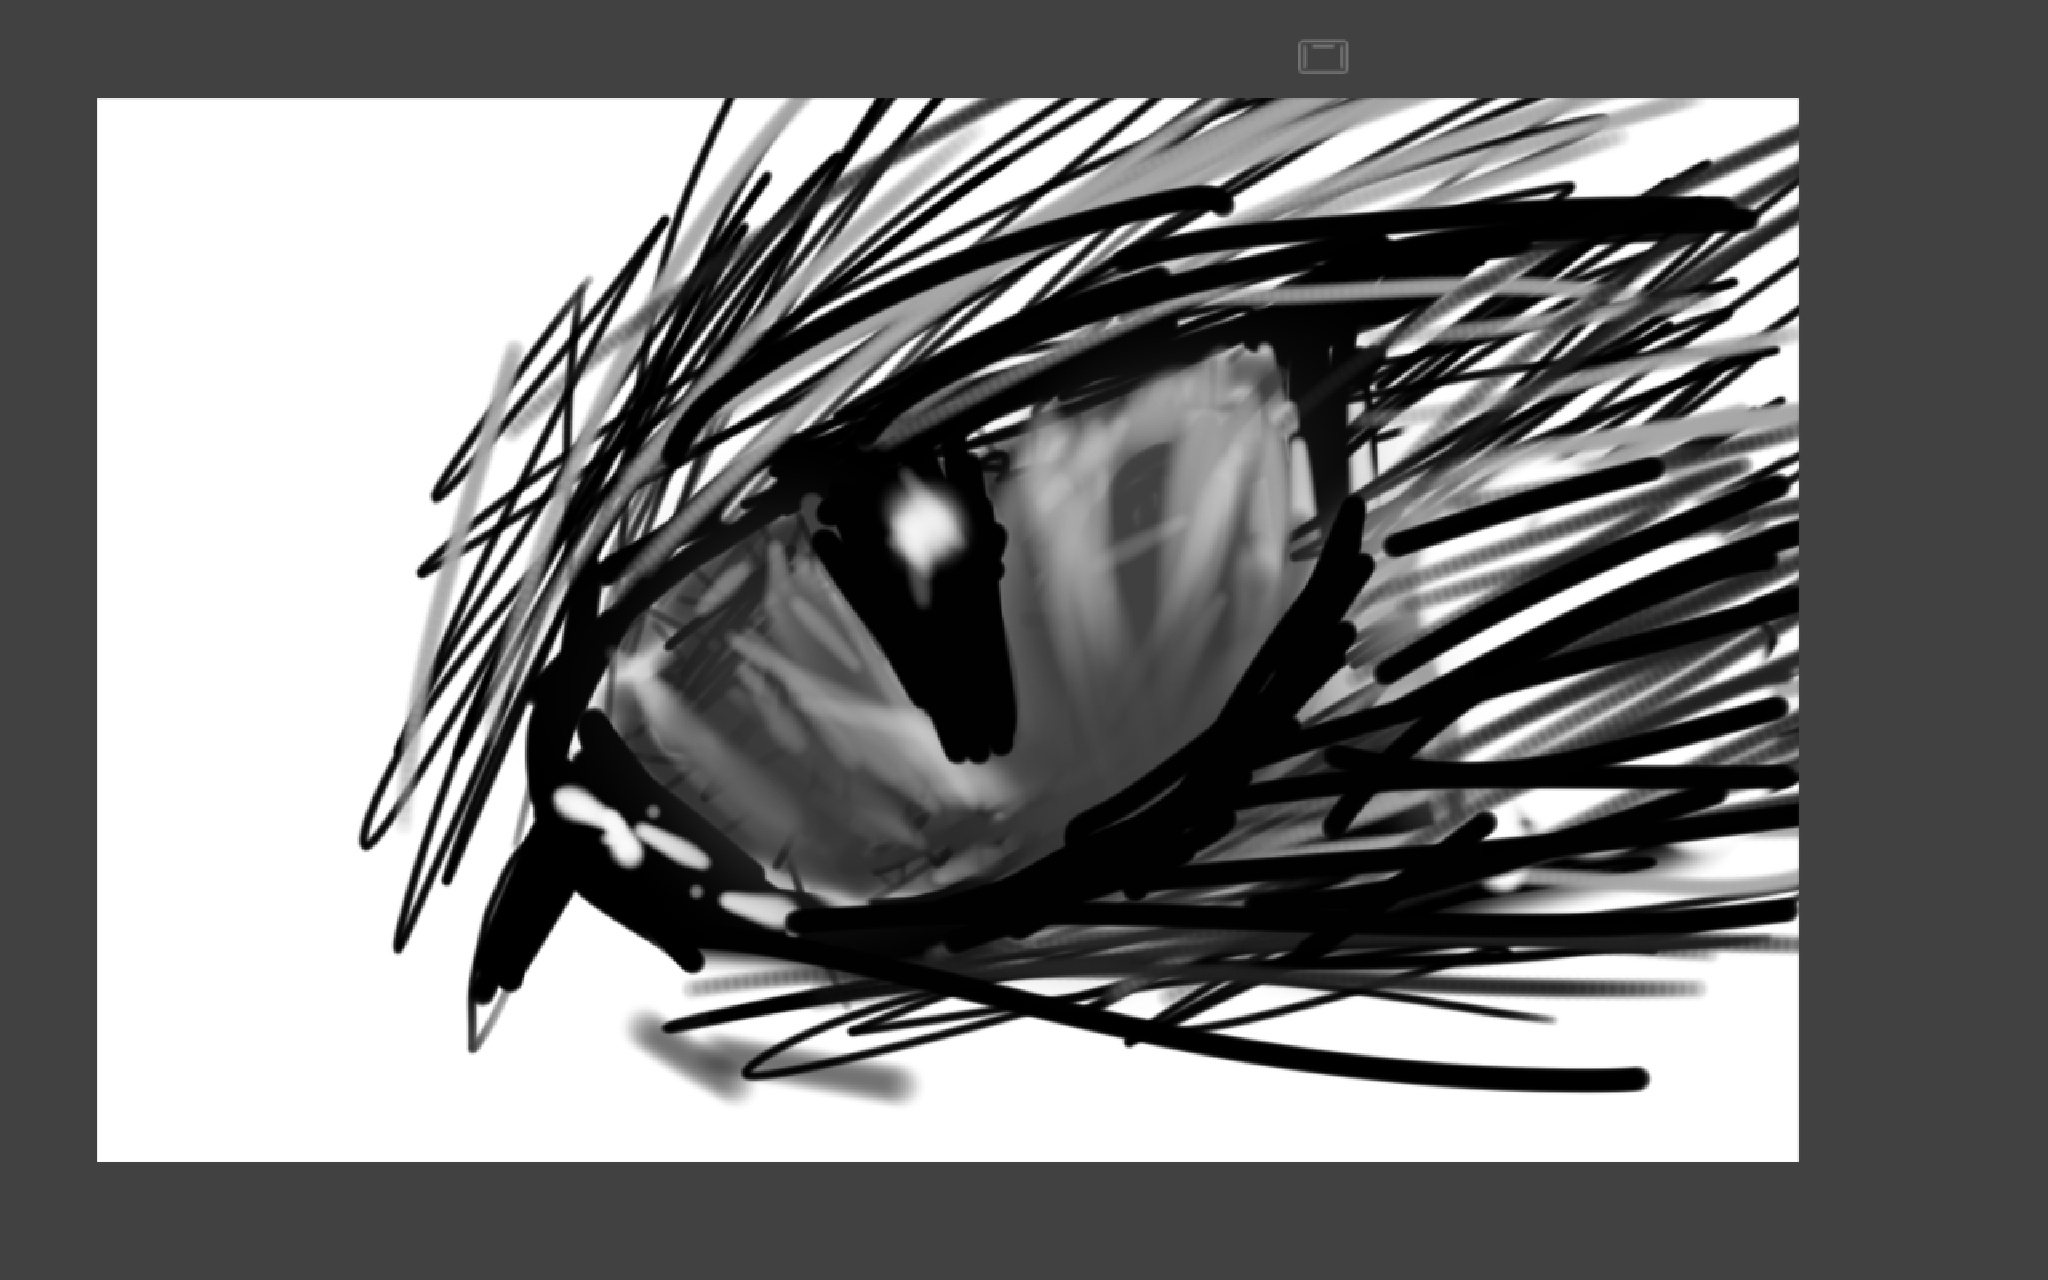 Animal eye by redfox348